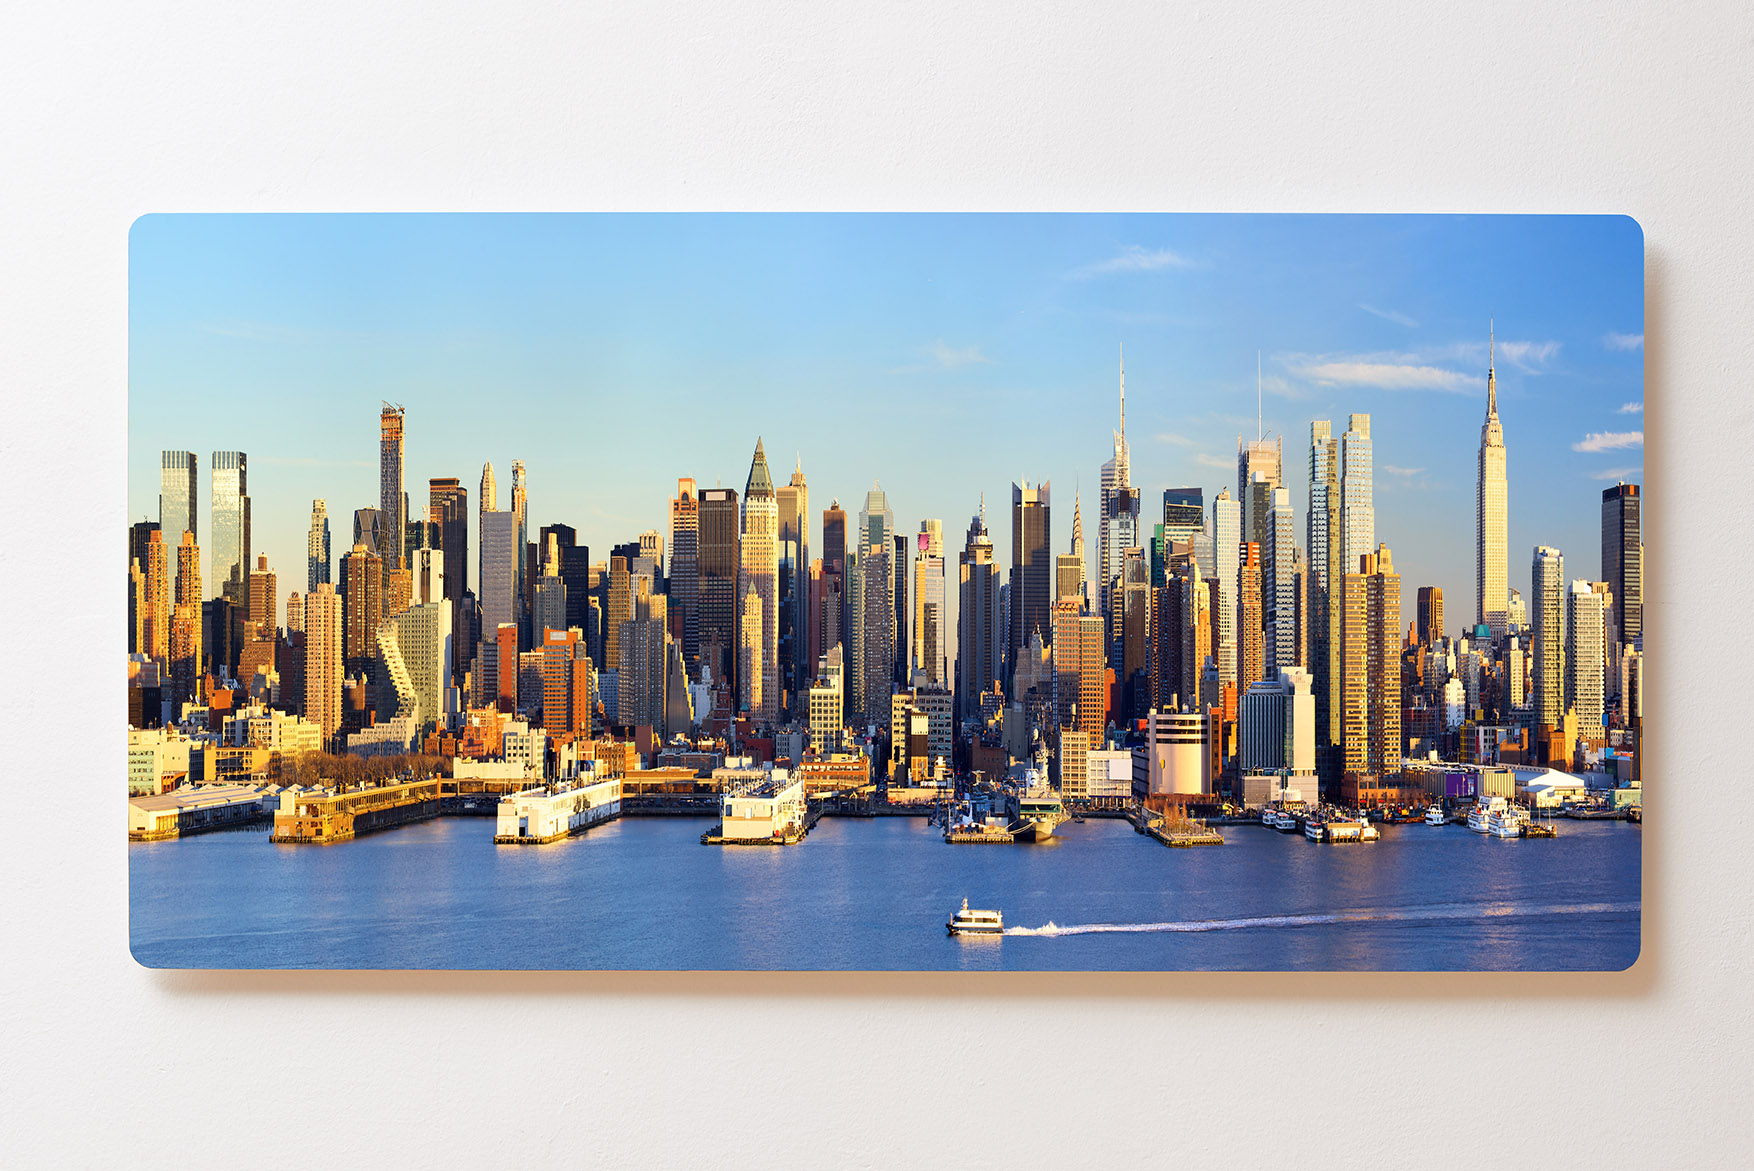 Magnettafel BACKLIGHT 120x60cm Motiv-Wandbild M100 New York Skyline